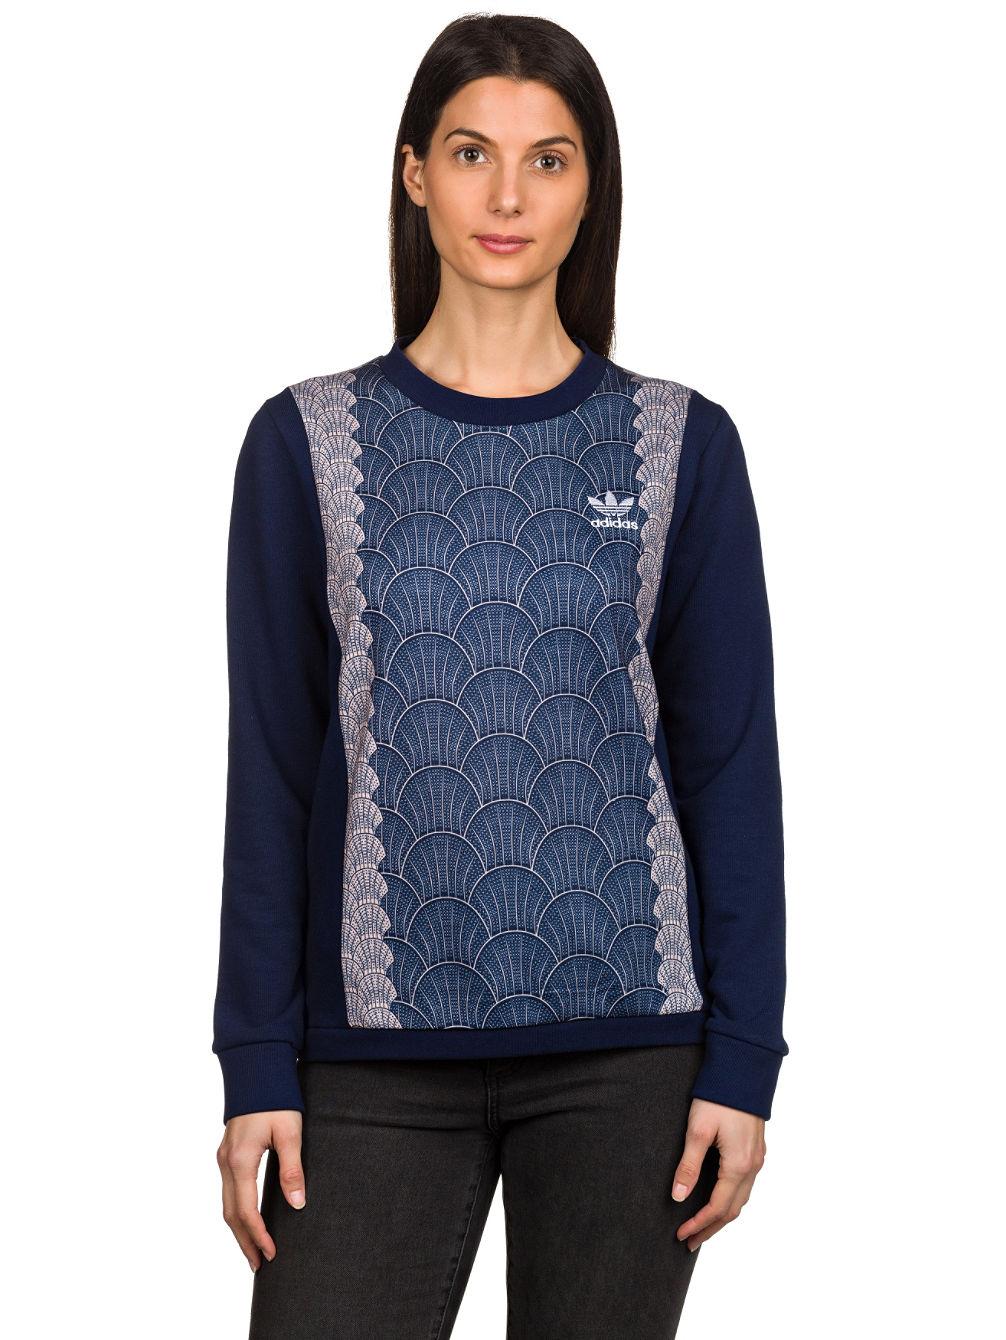 adidas-originals-shell-tile-aop-sweater